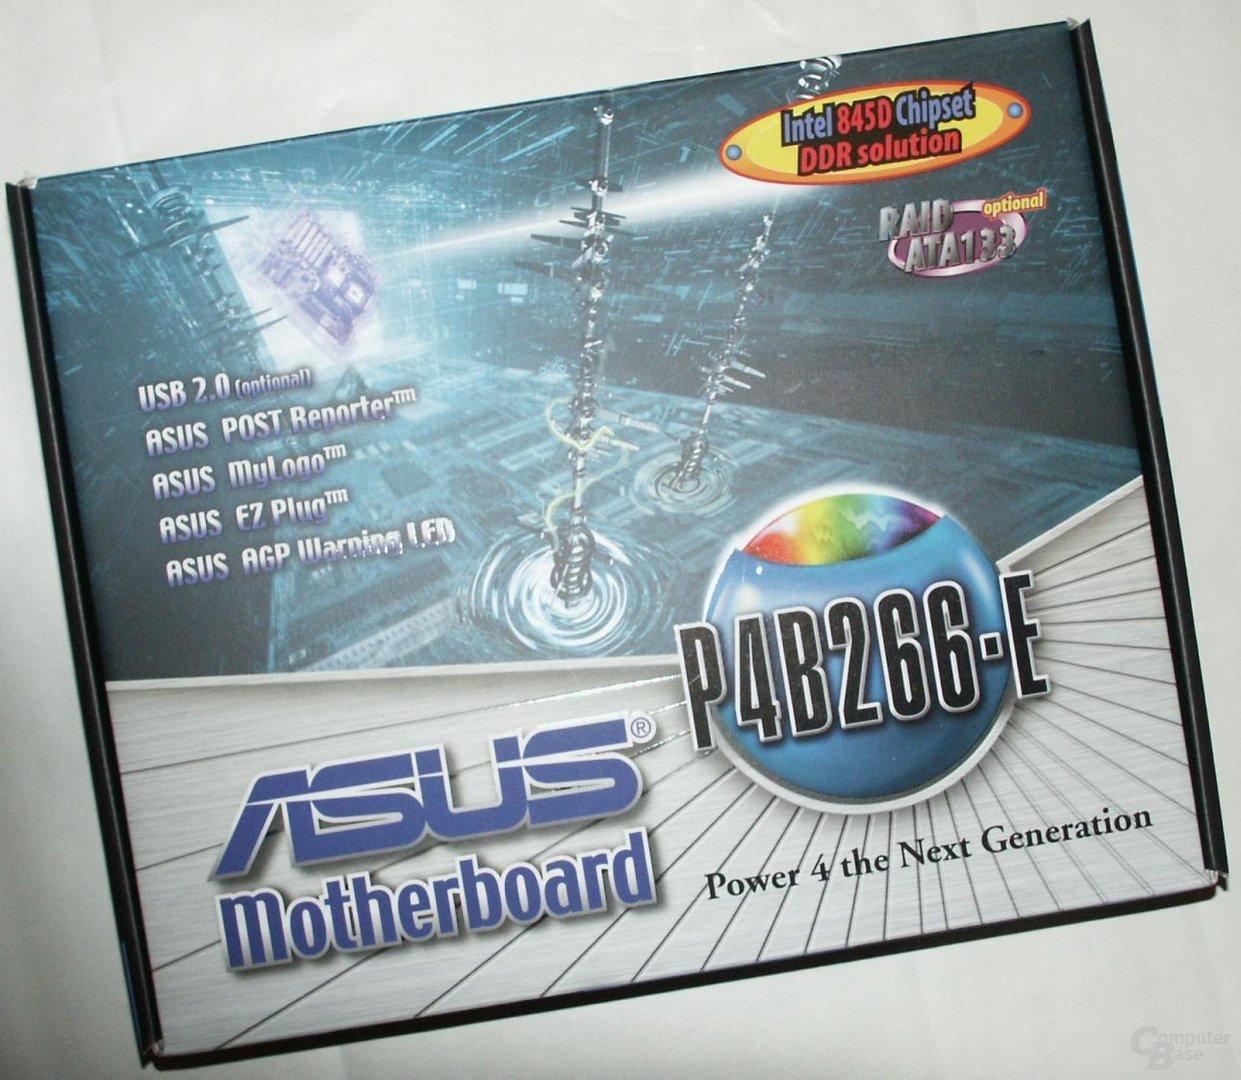 P4B266-E Verpackung